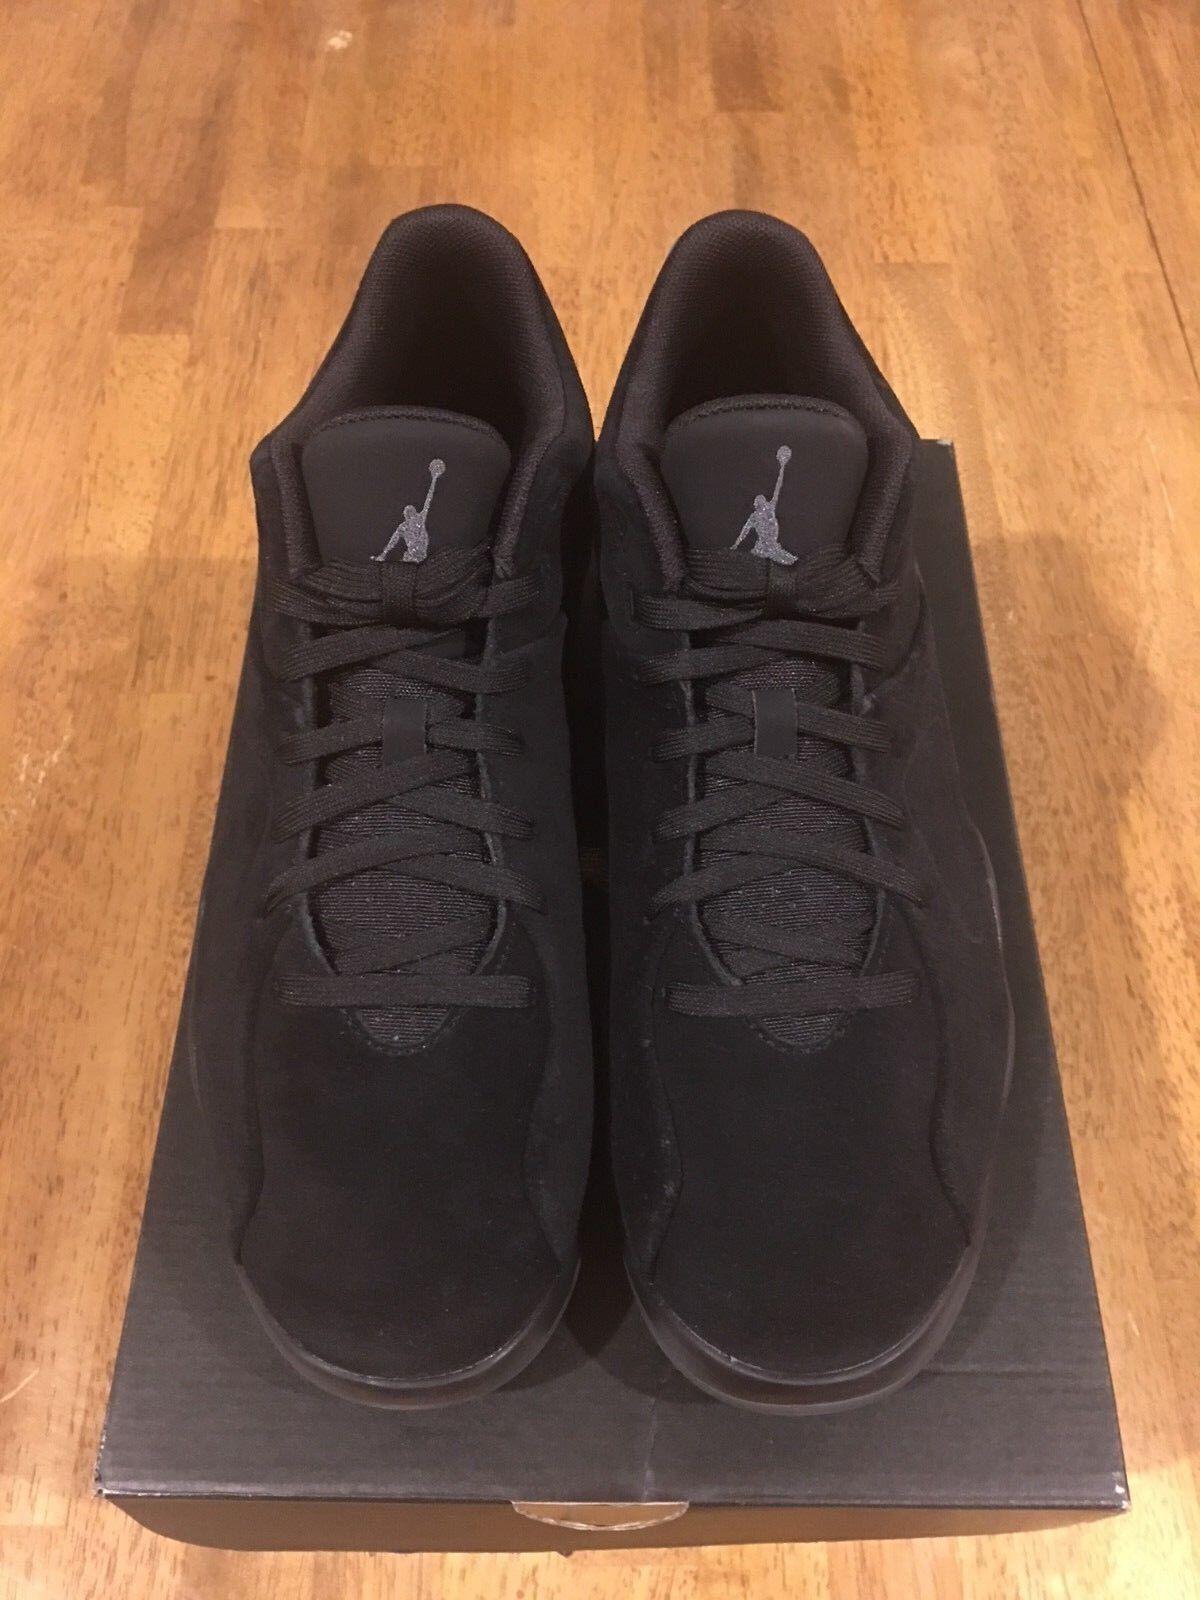 new style 7453e 35886 Nike Jordan Air Franchise Men s Shoes Size Size Size 10 Black 881472 011  NEW In Box e10a97